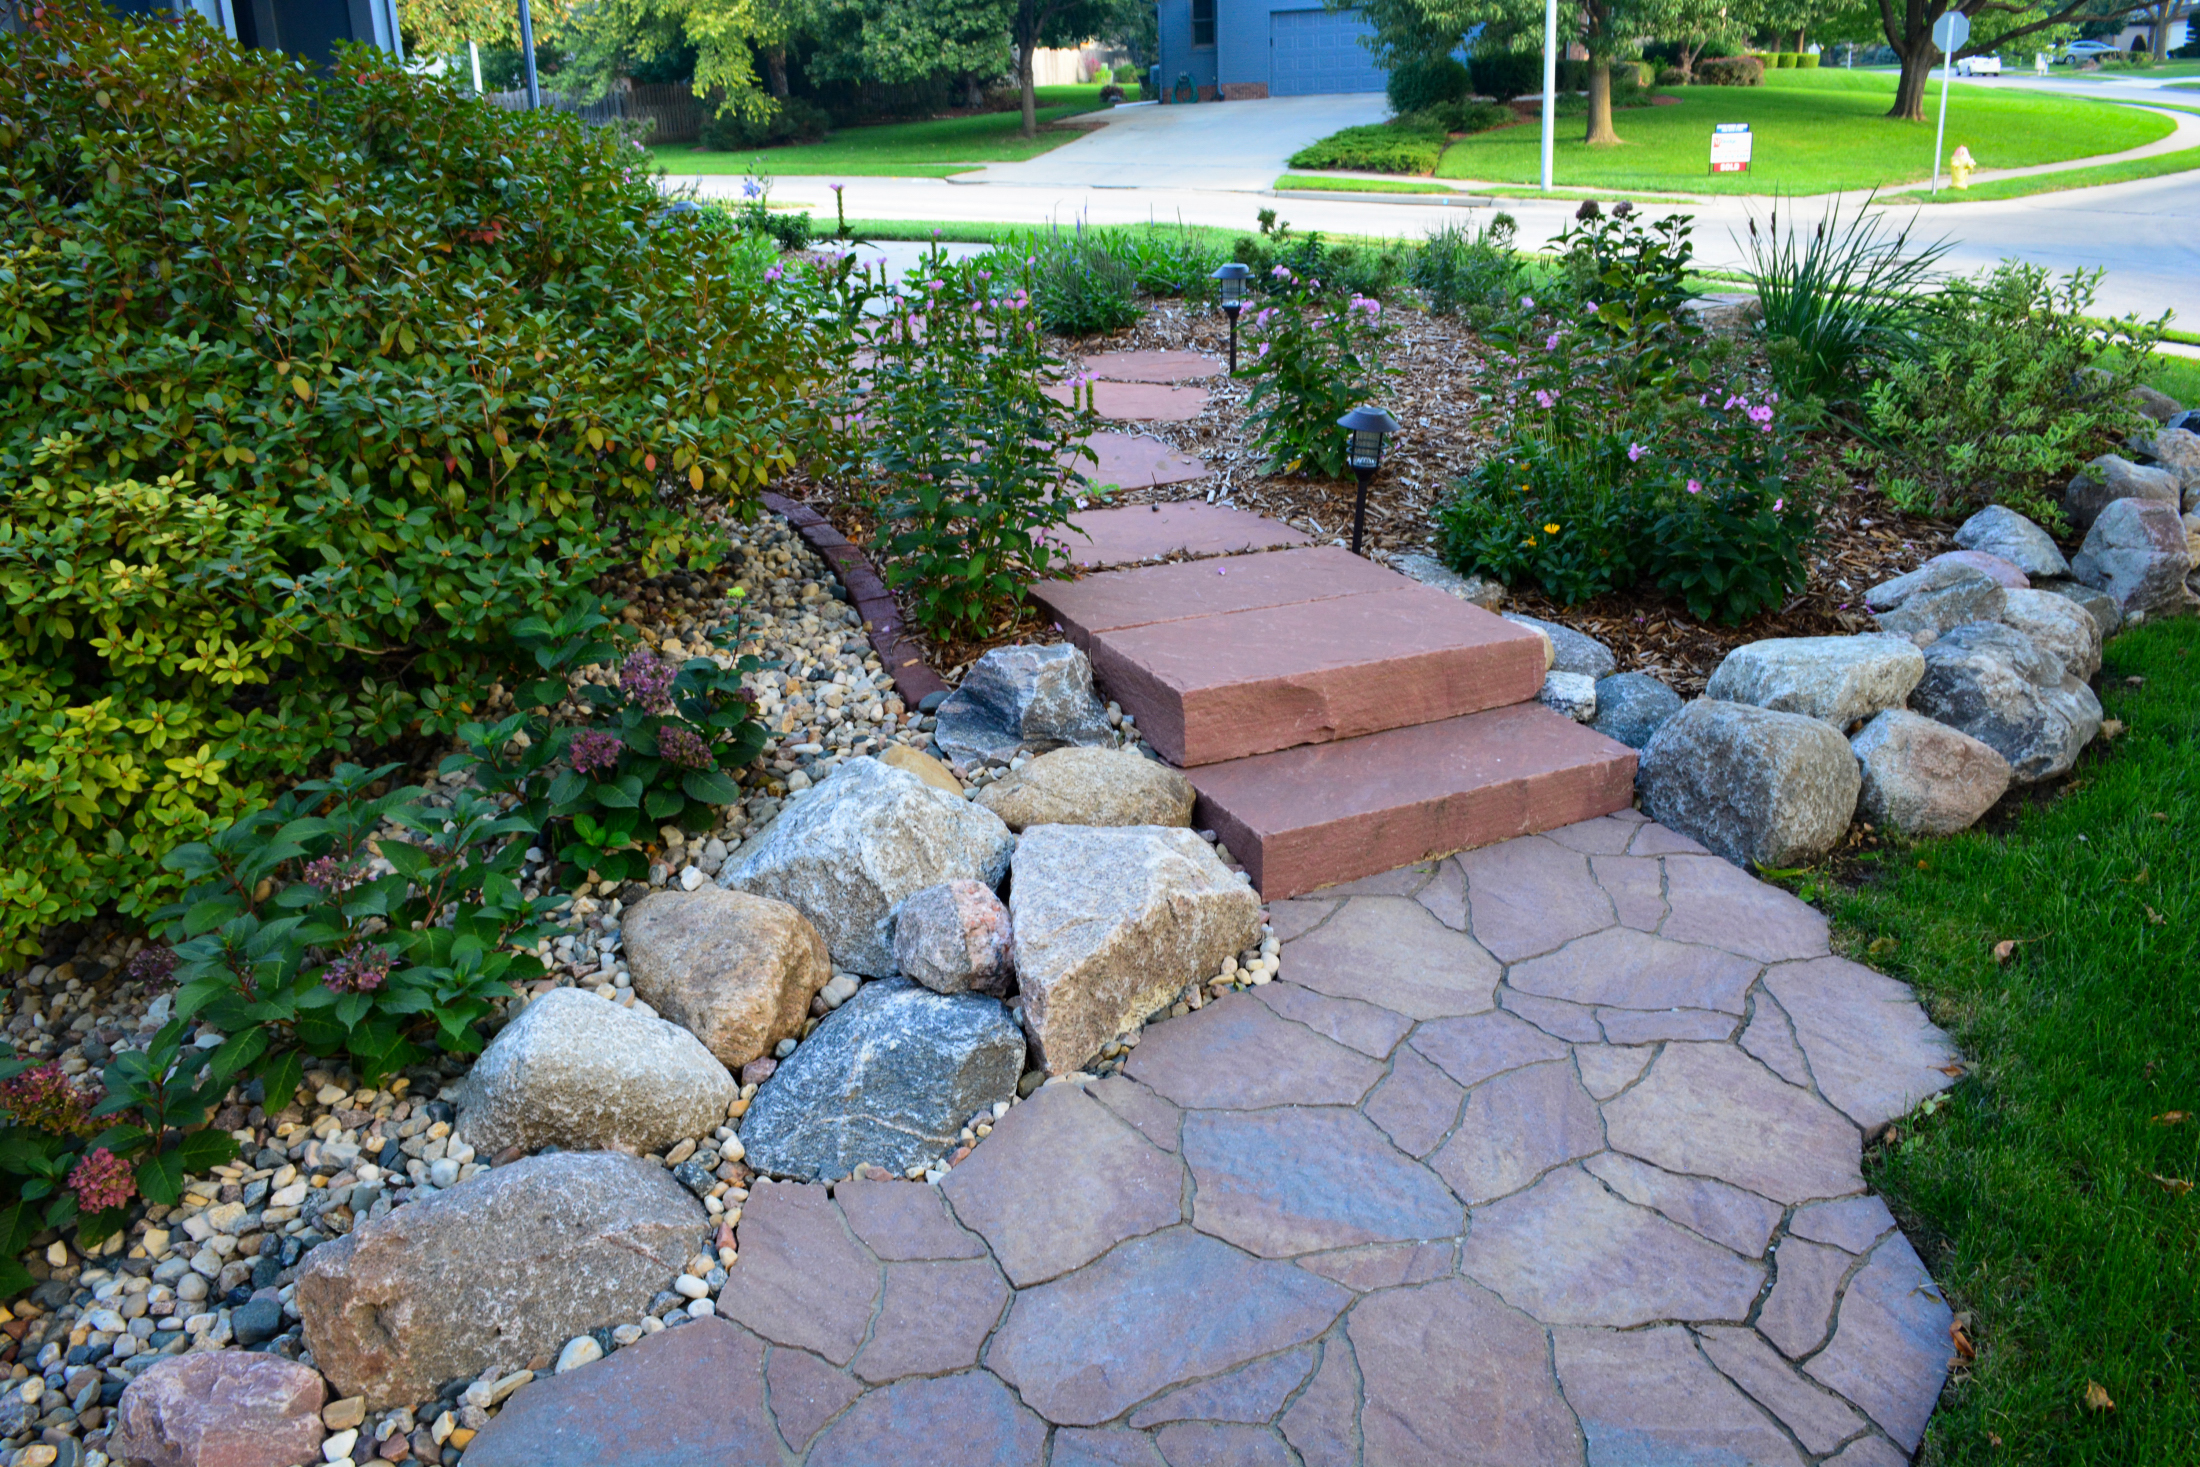 Steps-to-side-walk